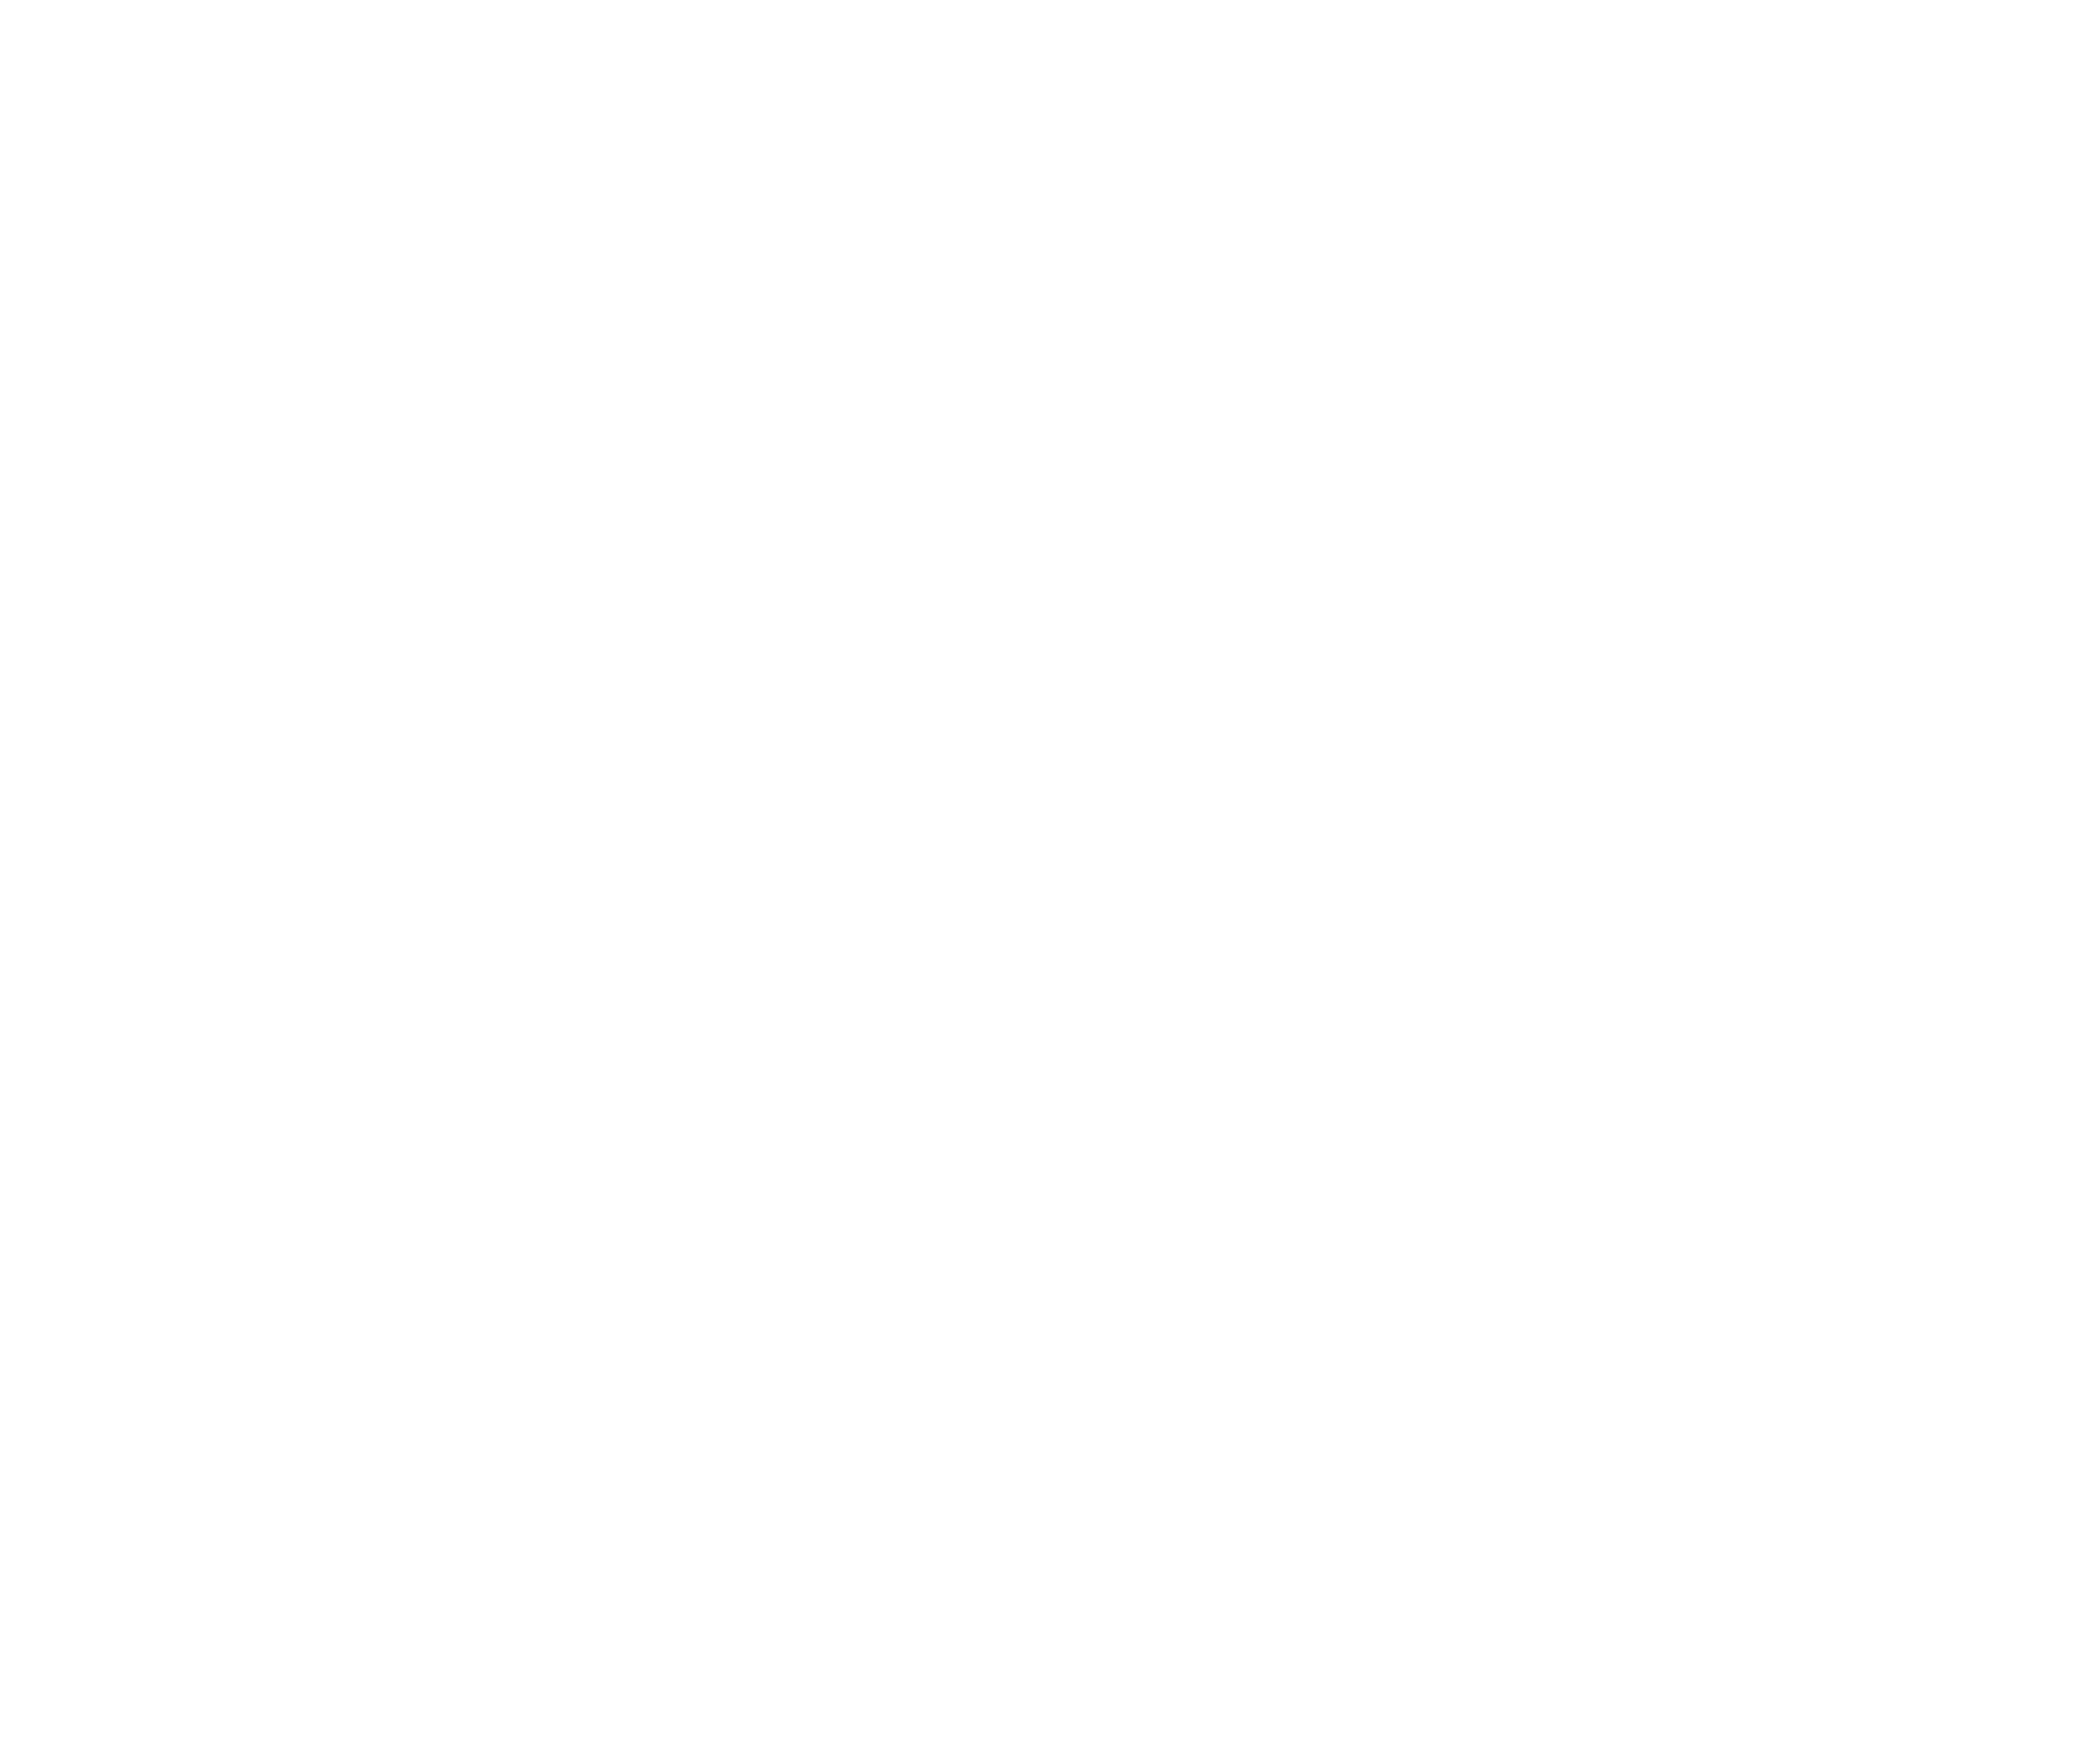 Offchain